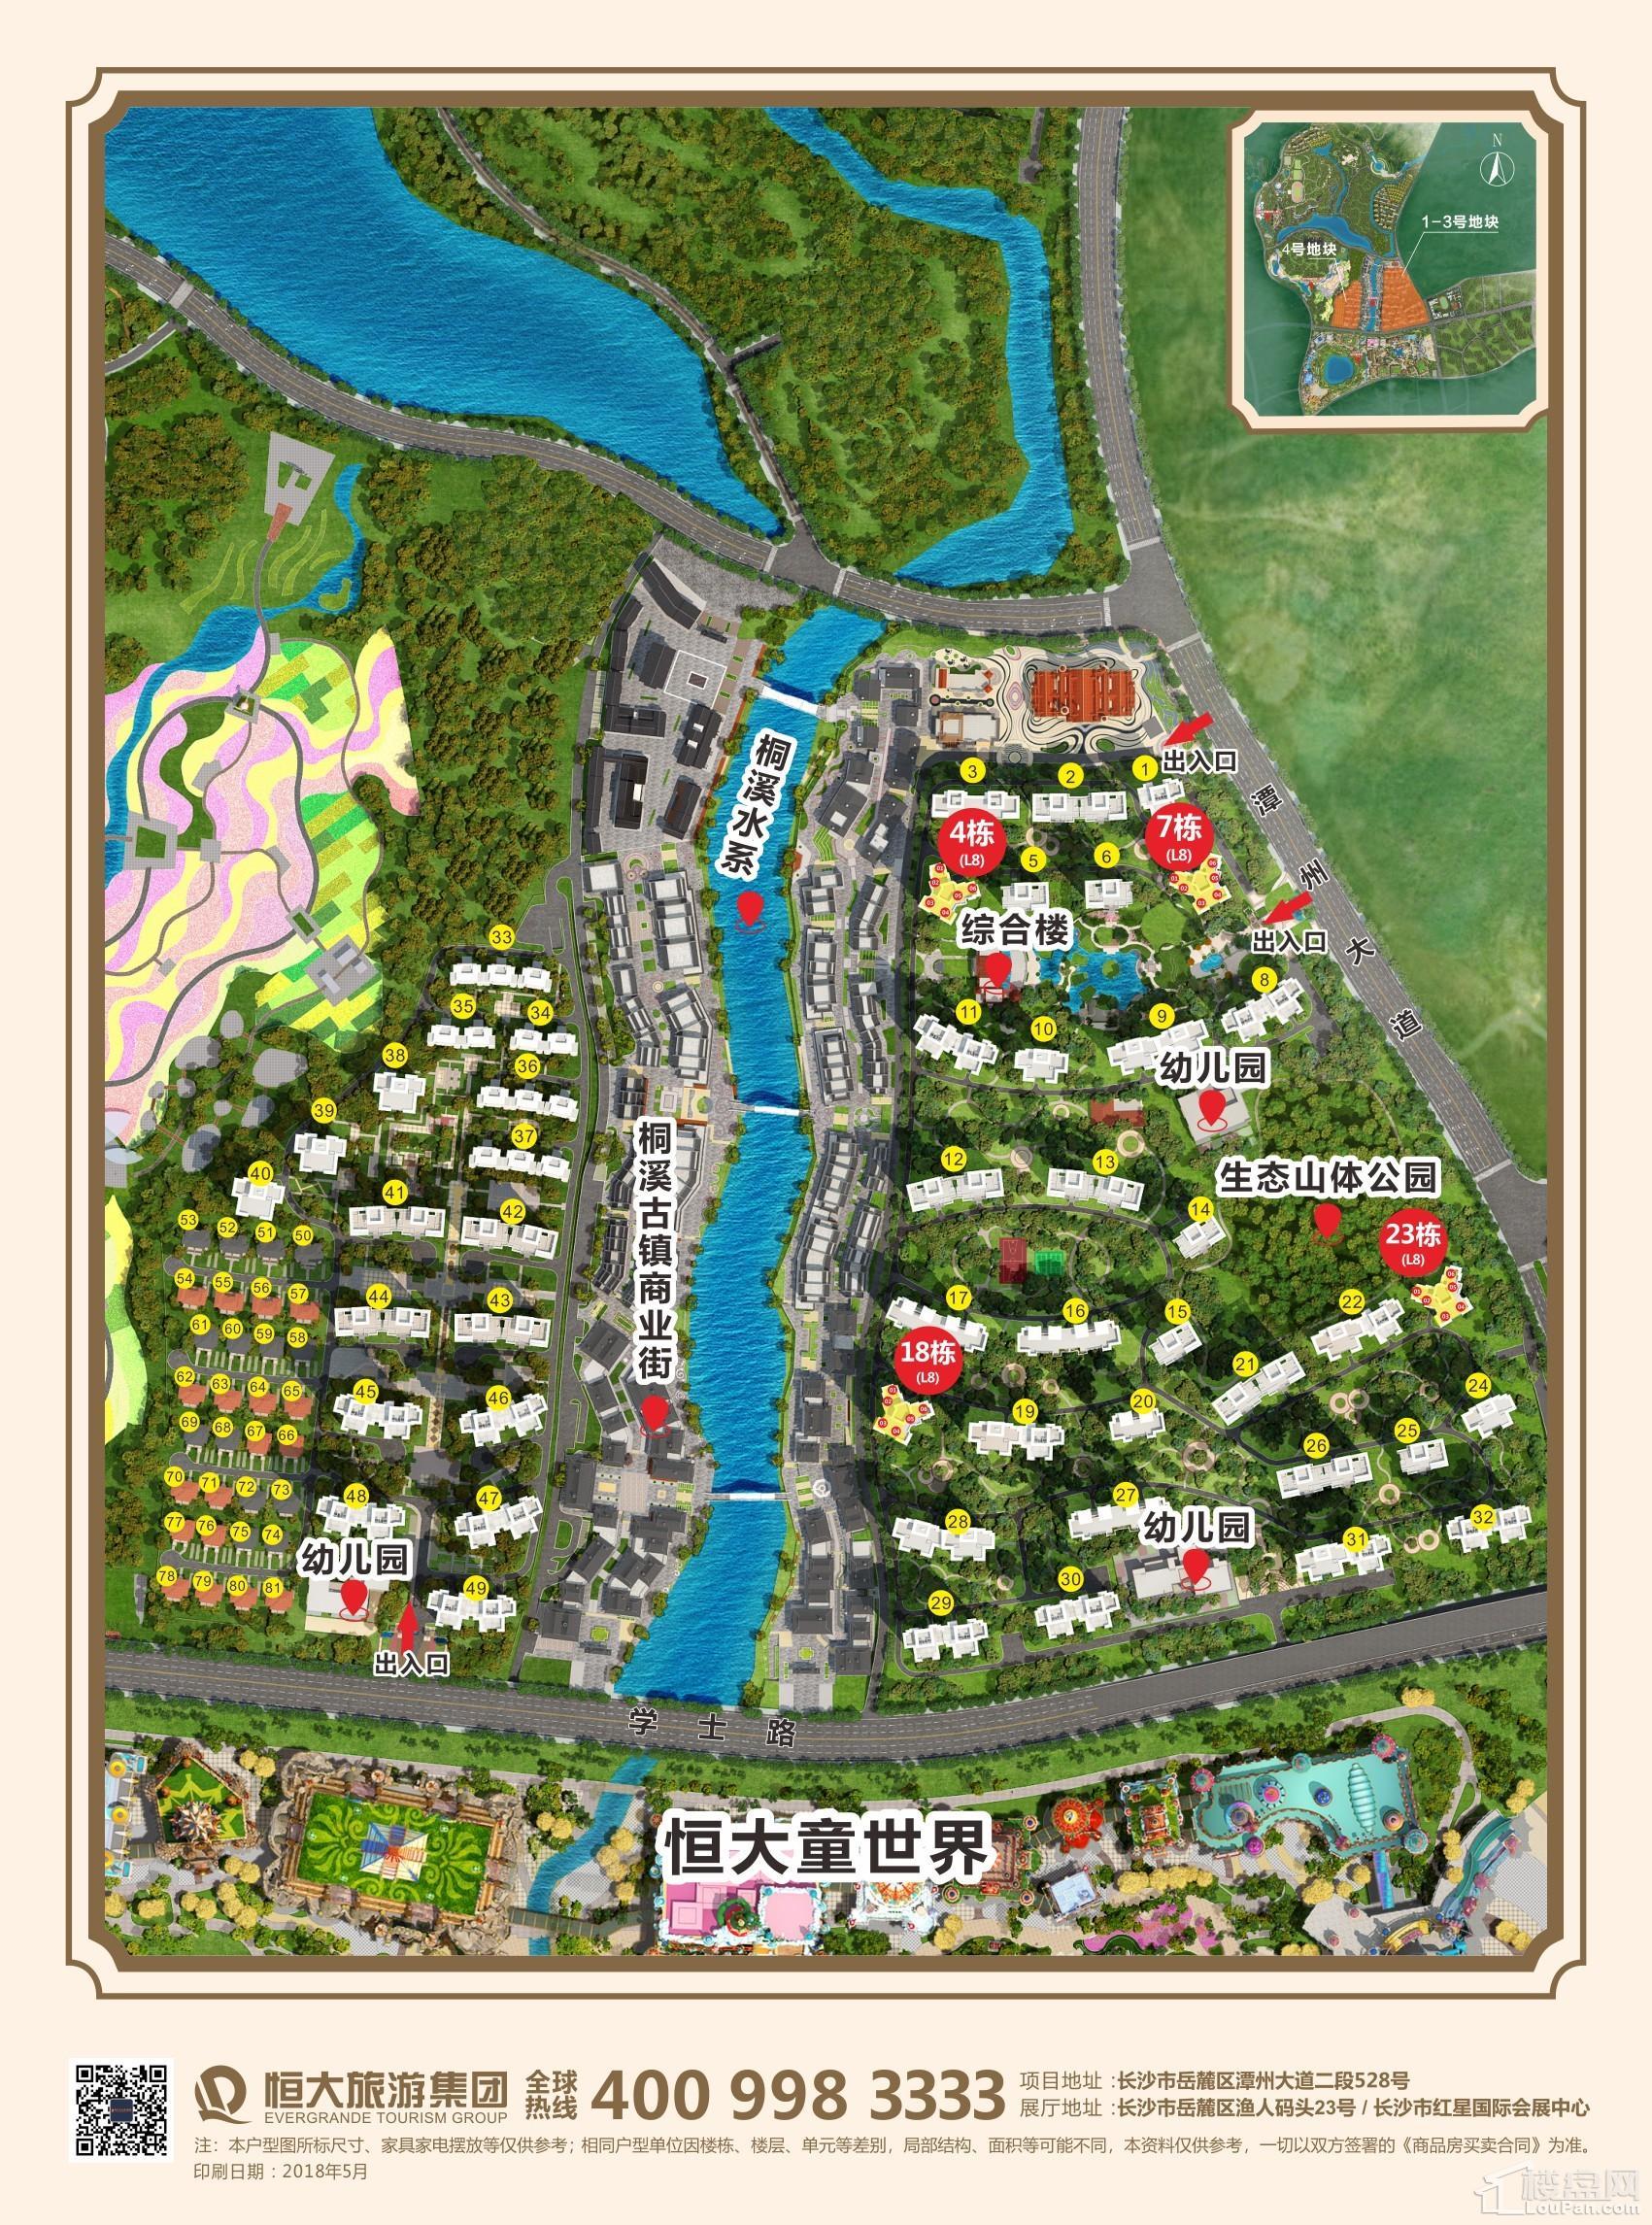 L8揽山高层所在4、17、18、23栋分布图